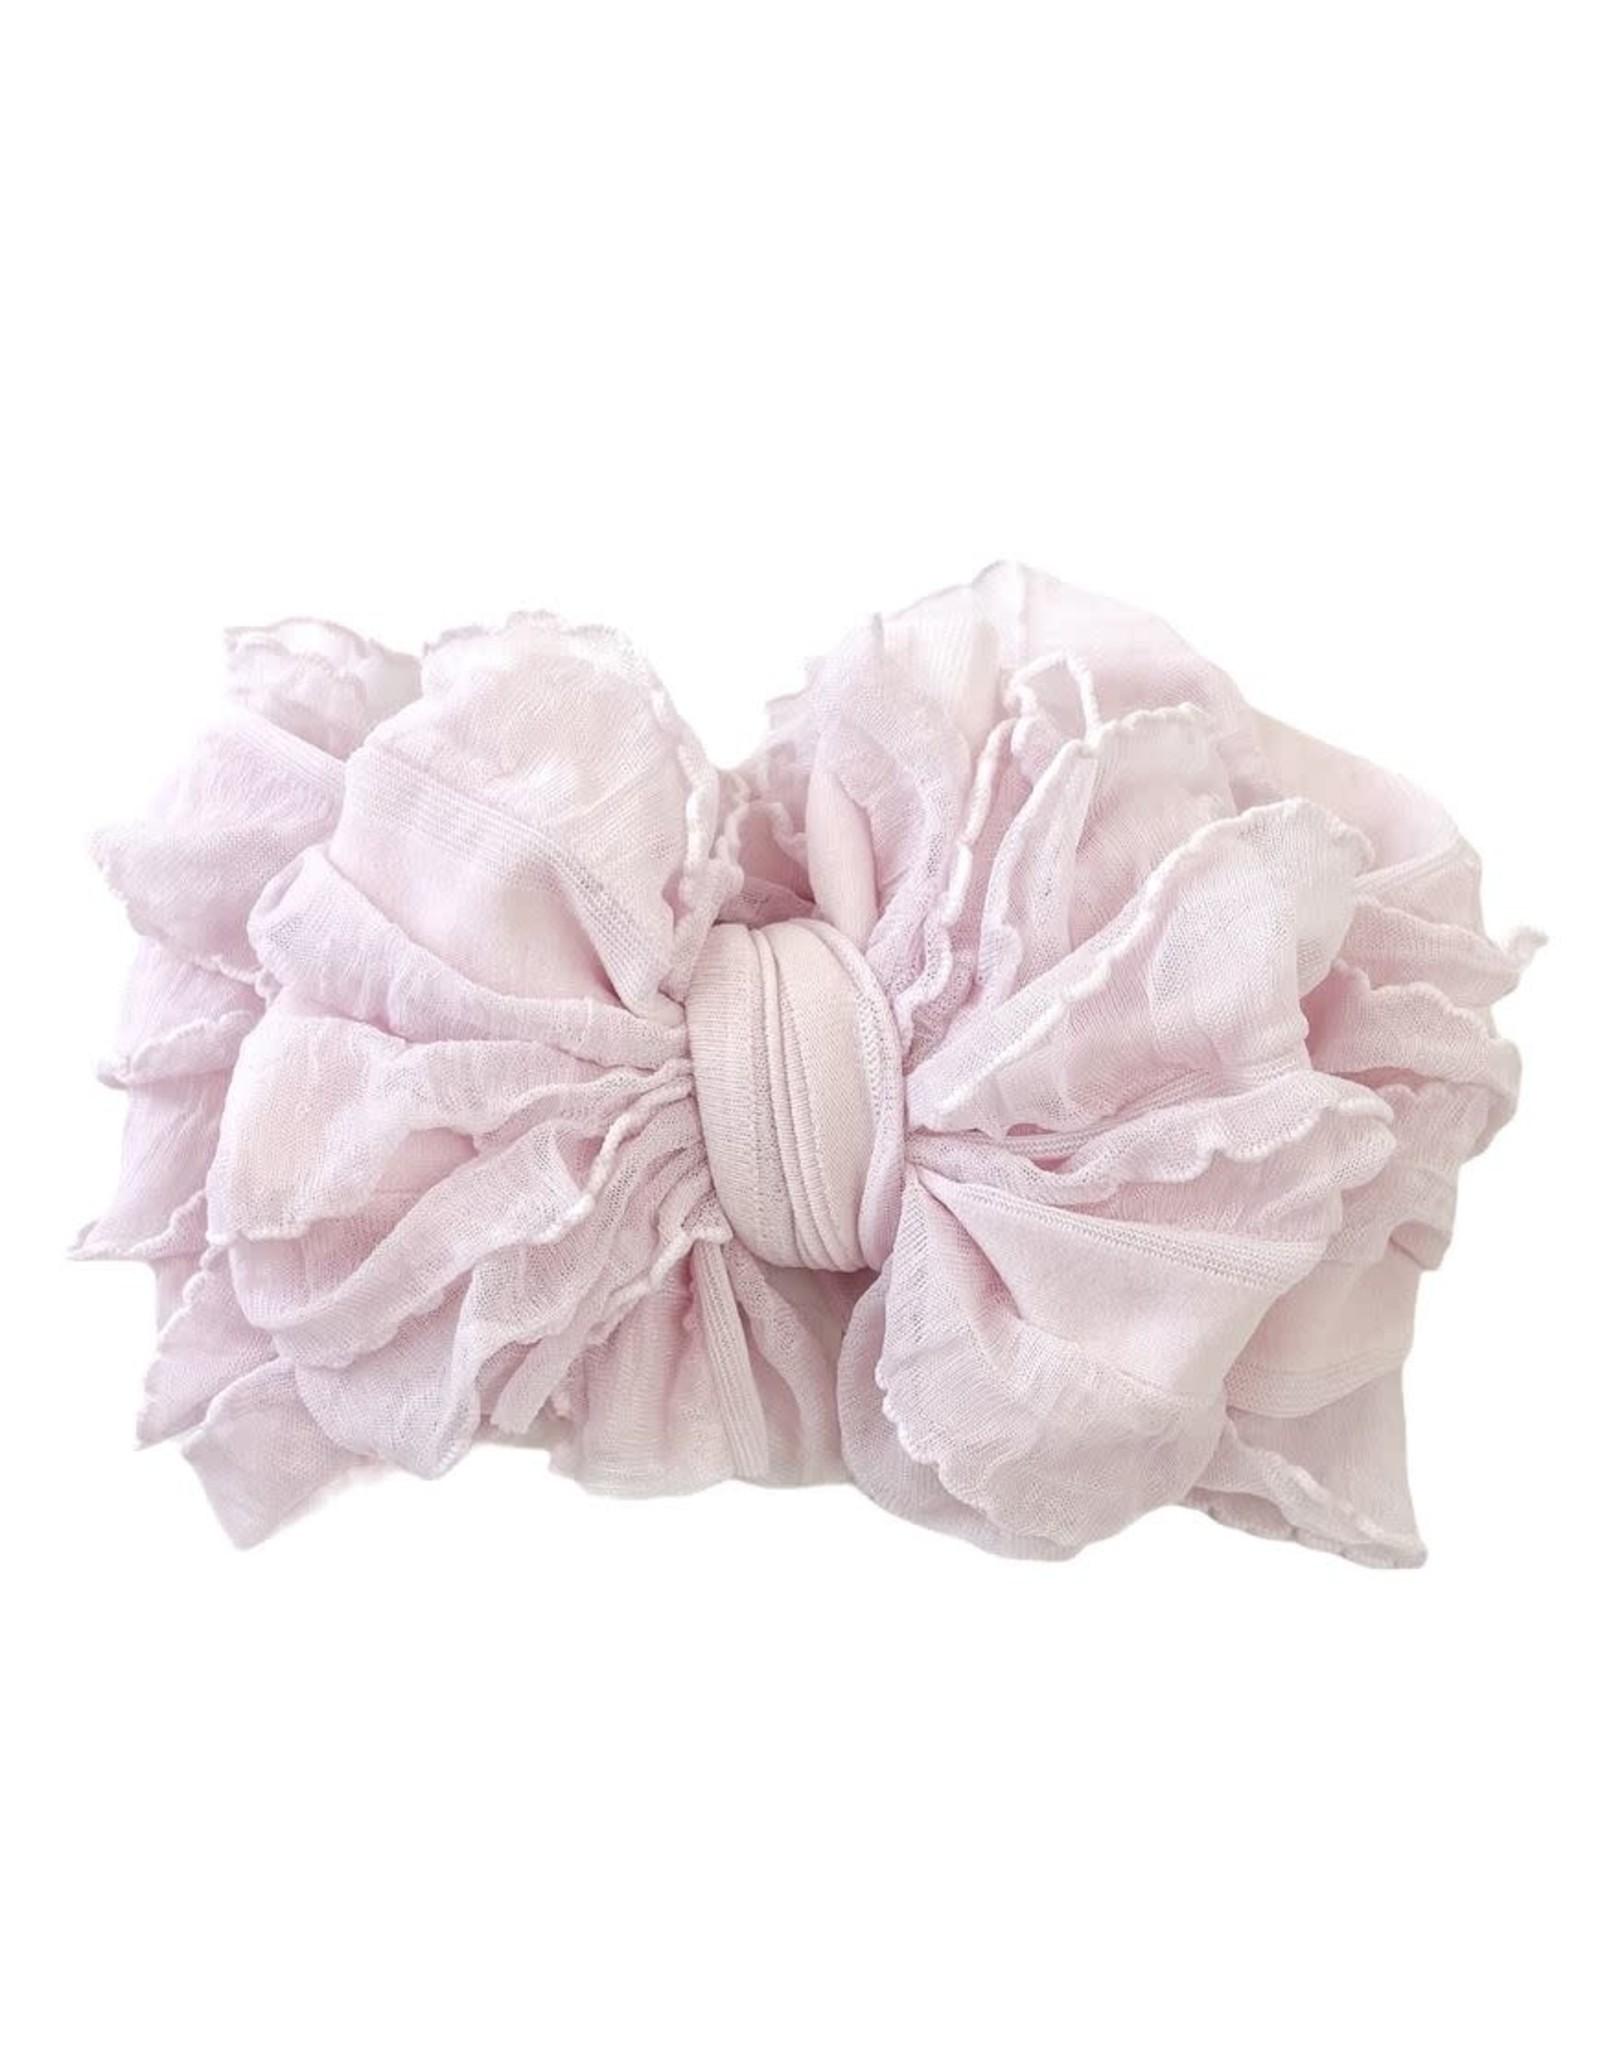 In Awe- Baby Pink Headband